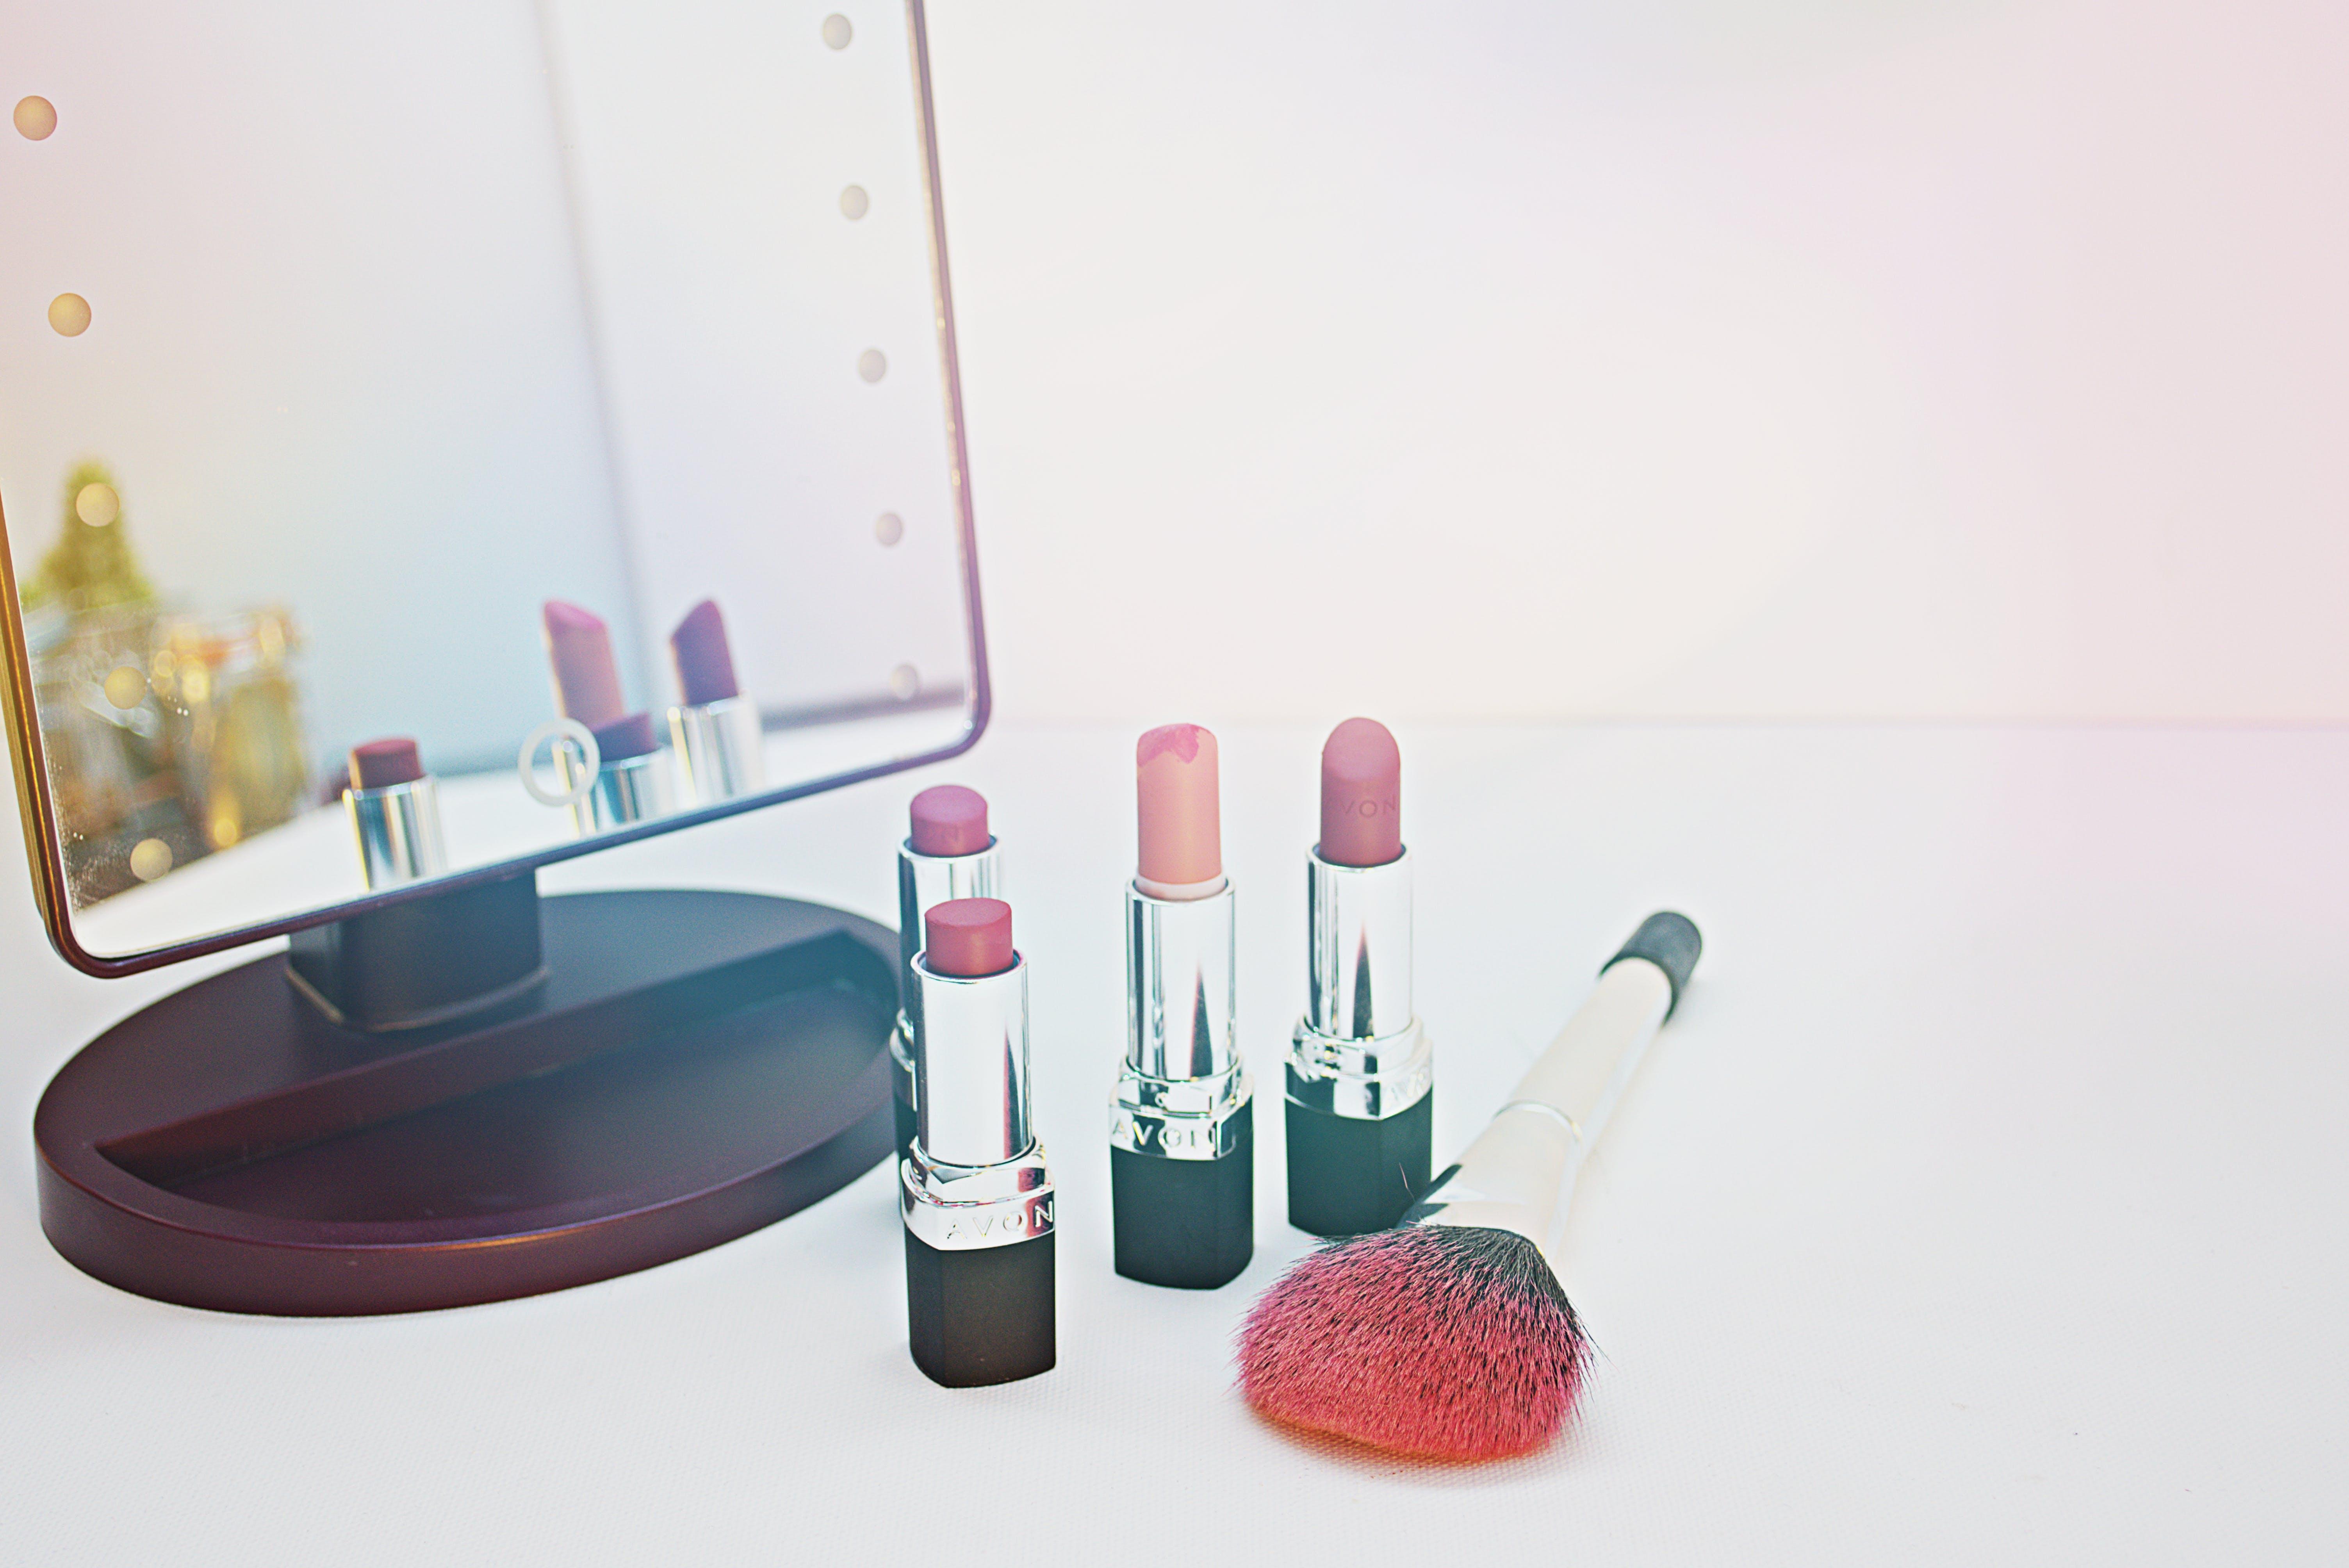 Four Assorted-color Lipsticks Beside Makeup Brush